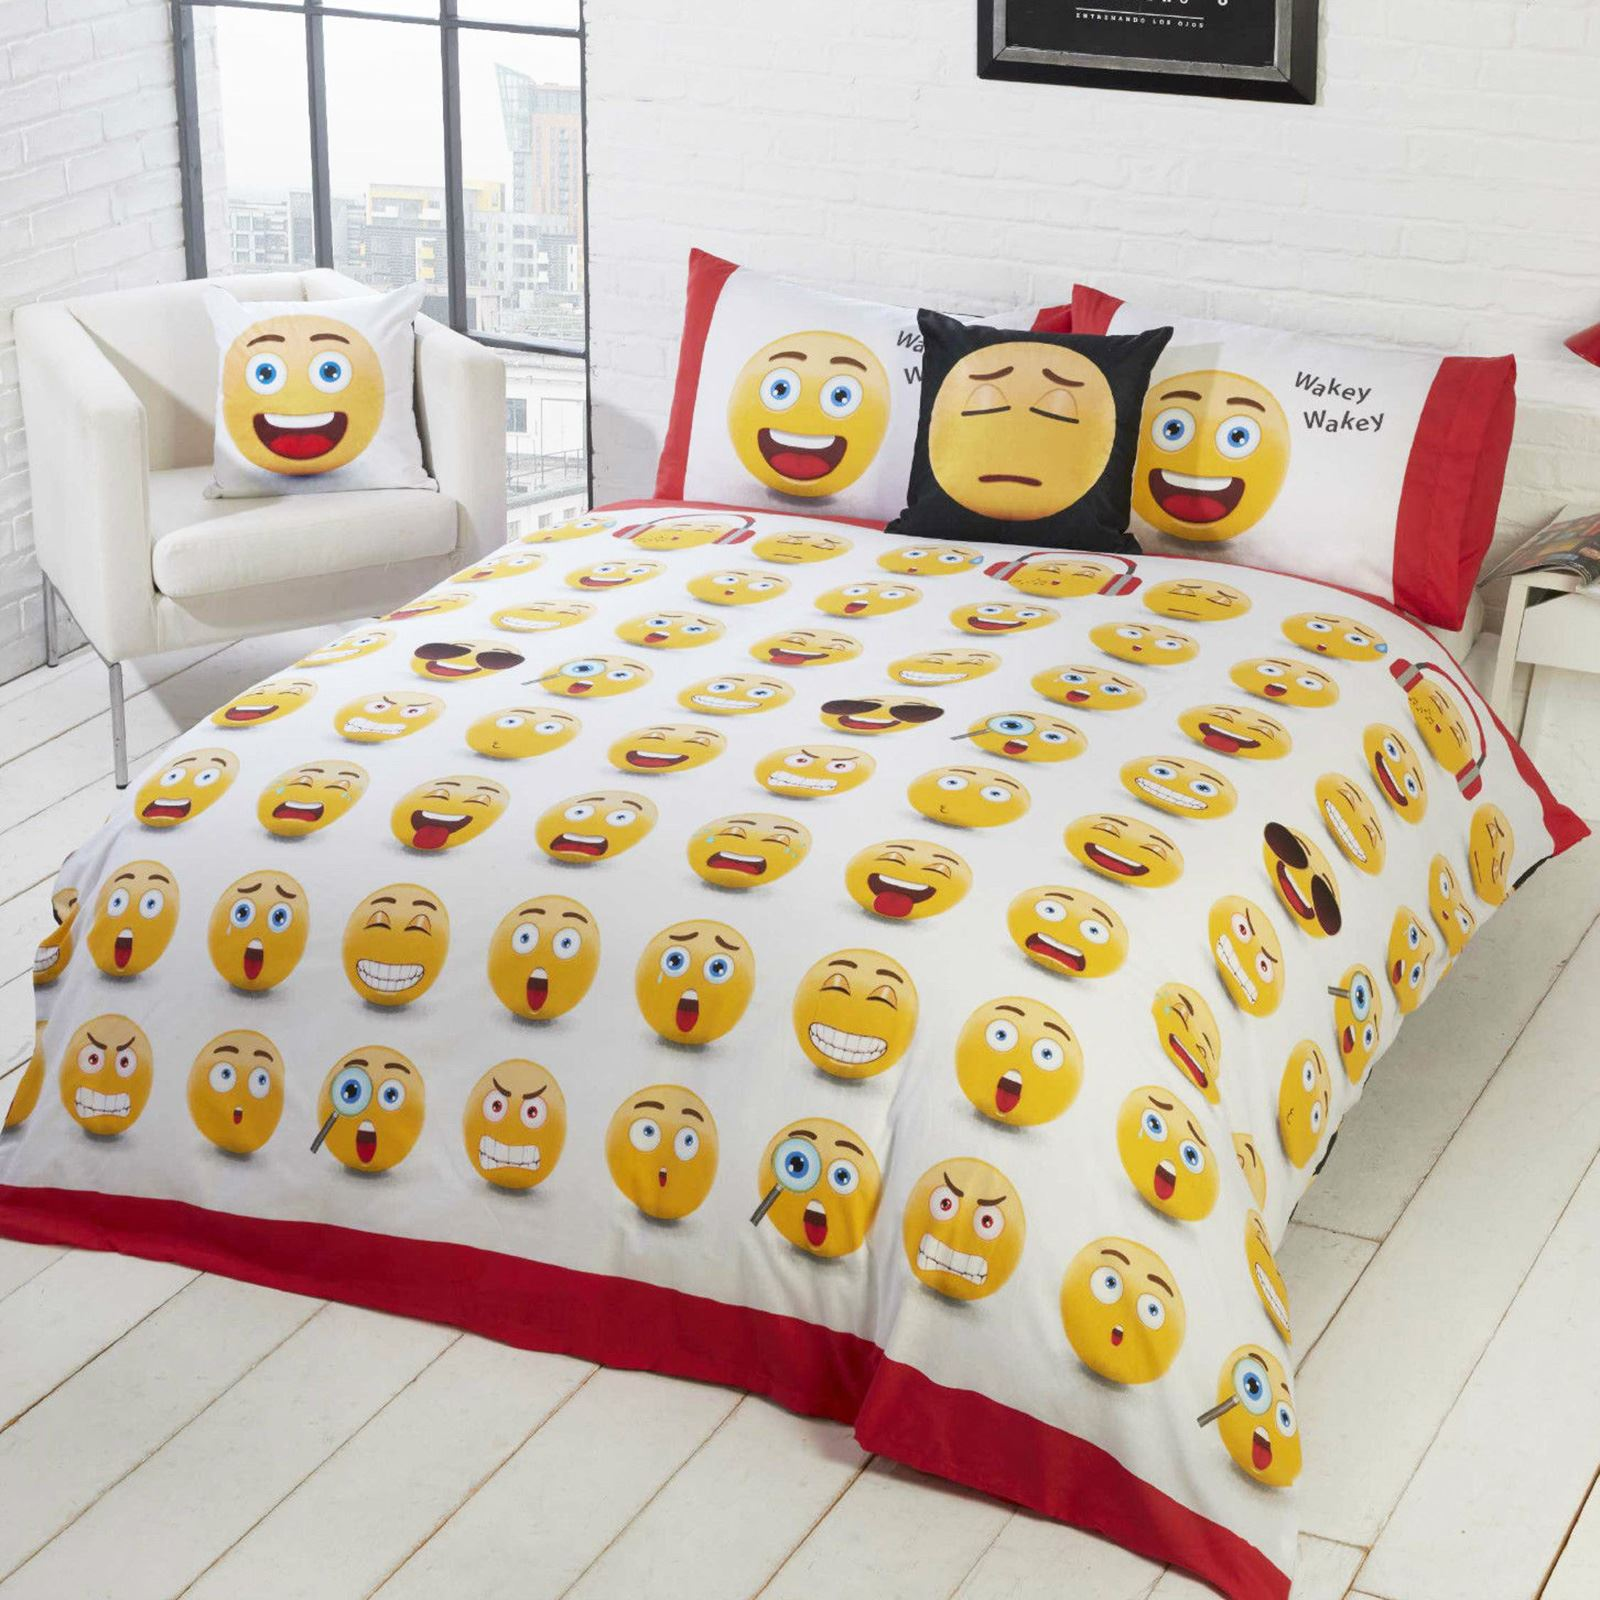 Emoji Icons Single Duvet Cover Set Reversible Design 2 In